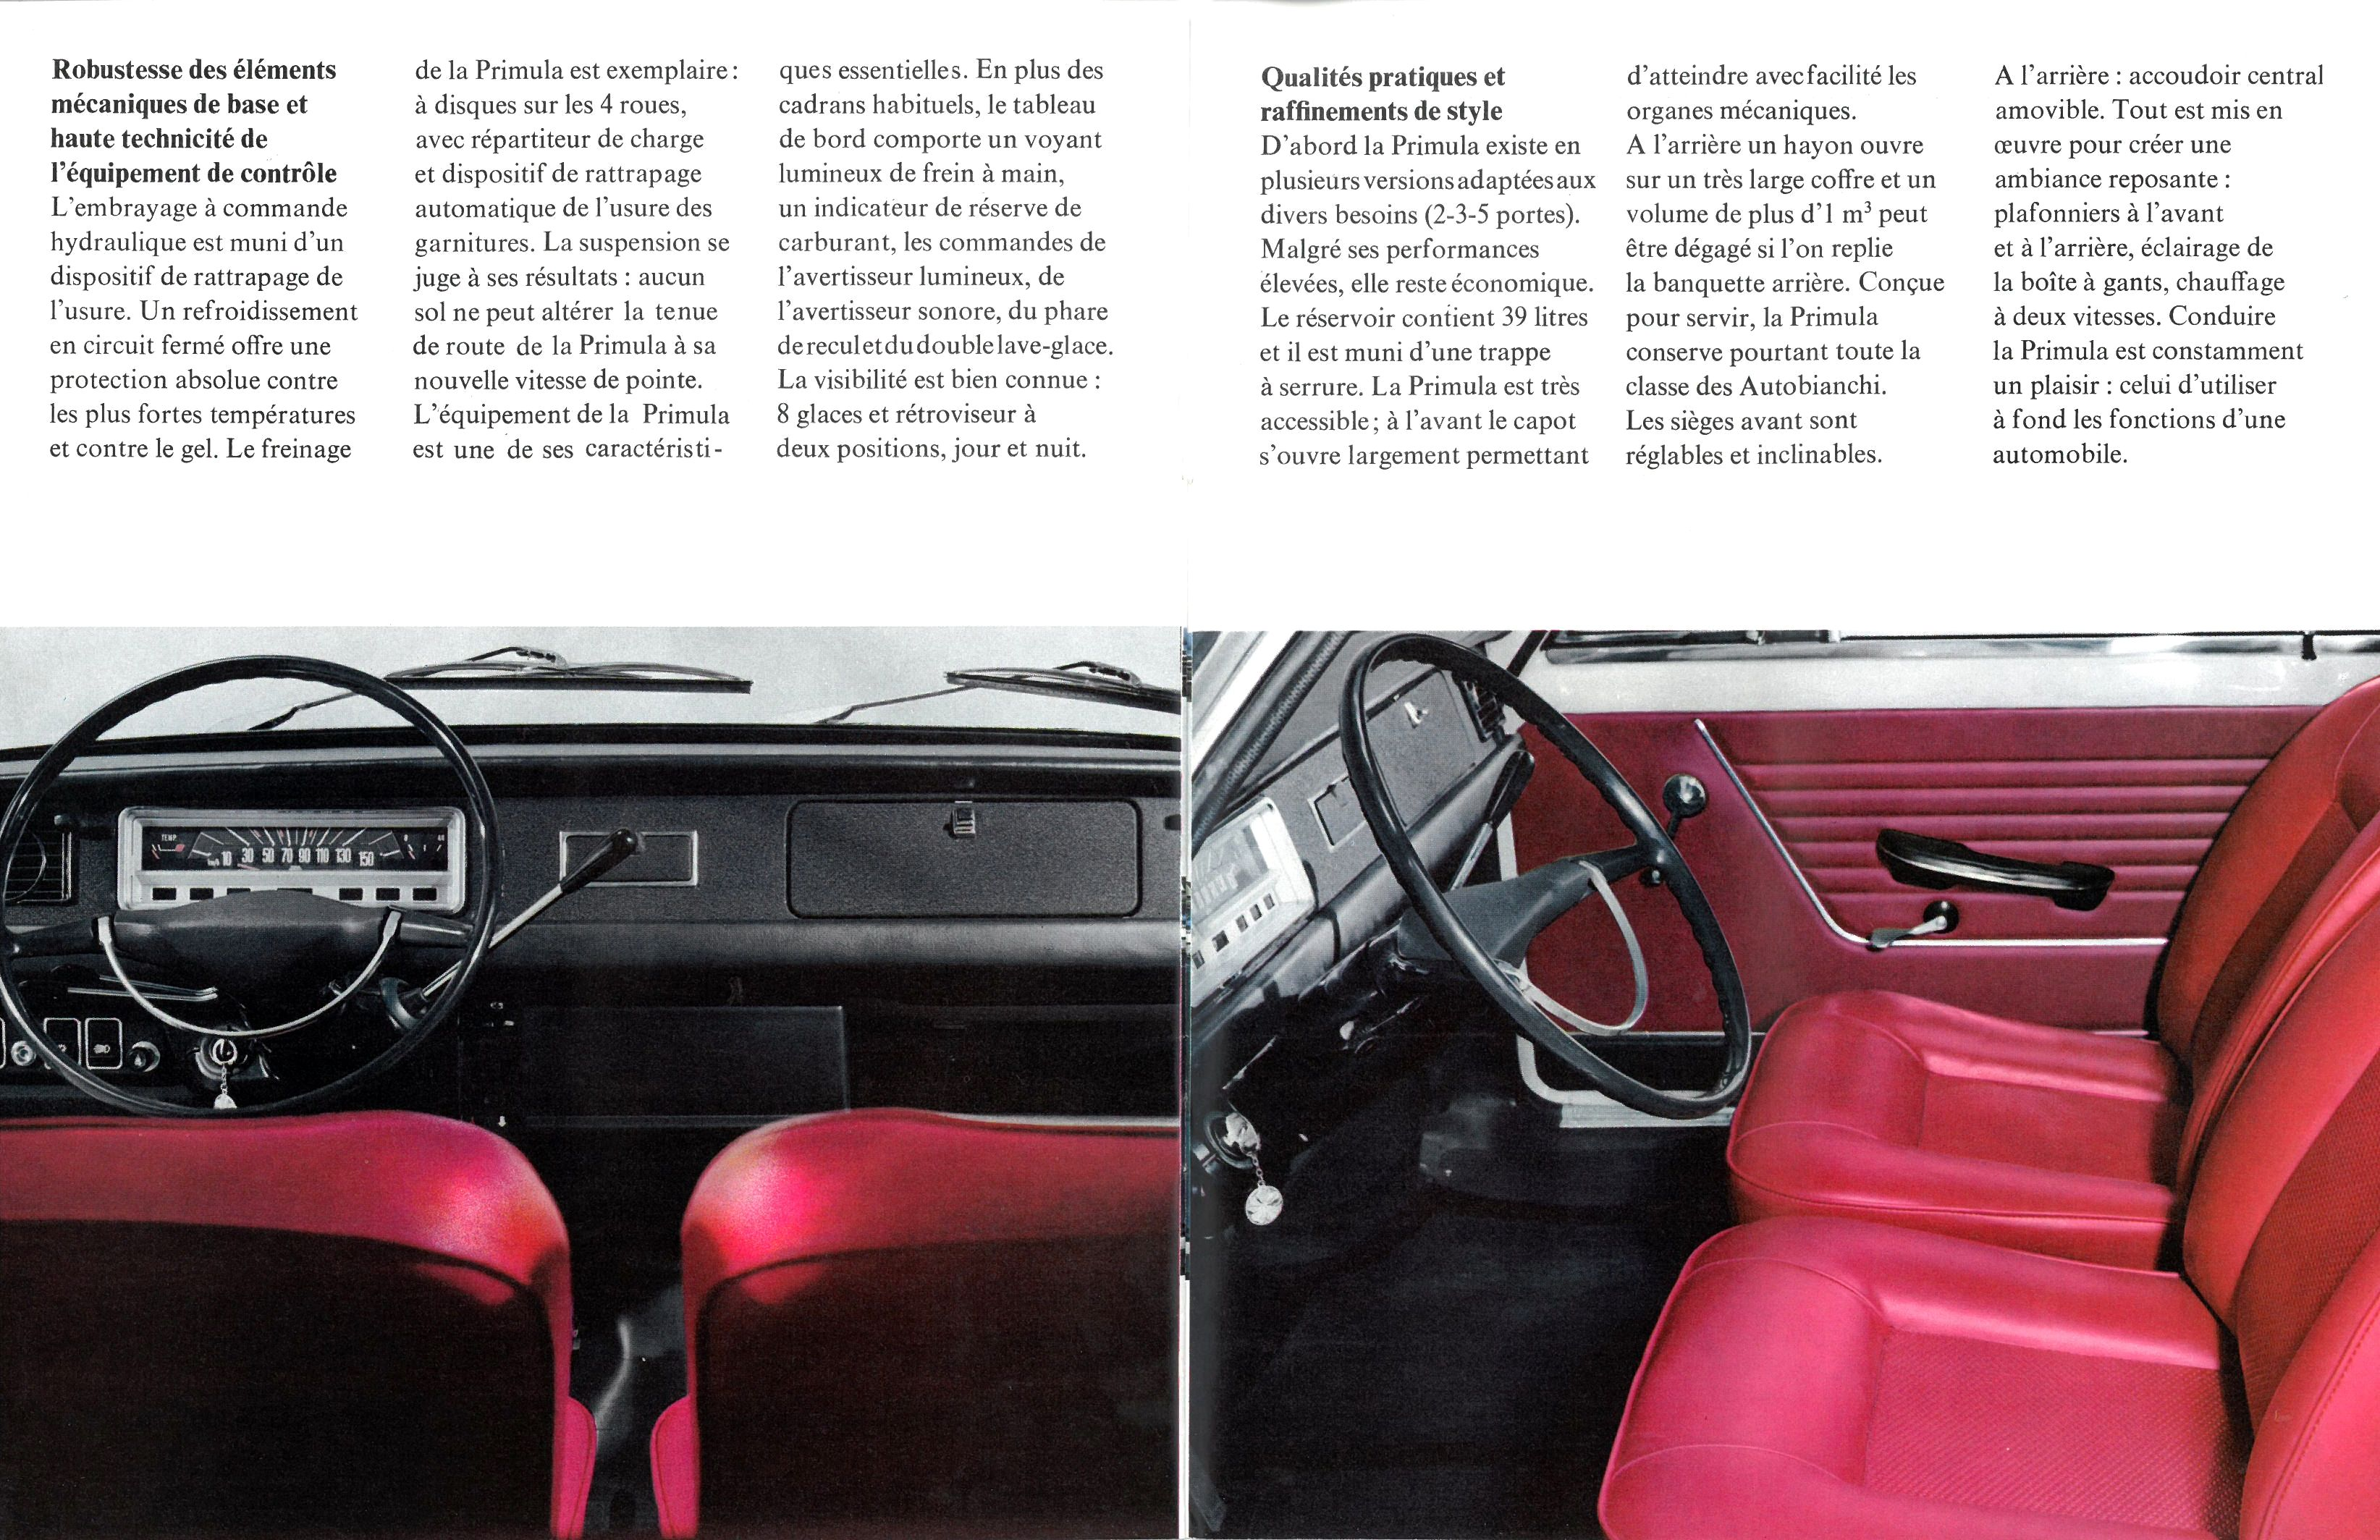 Ambiance Et Style Tableau 1969 autobianchi brochure